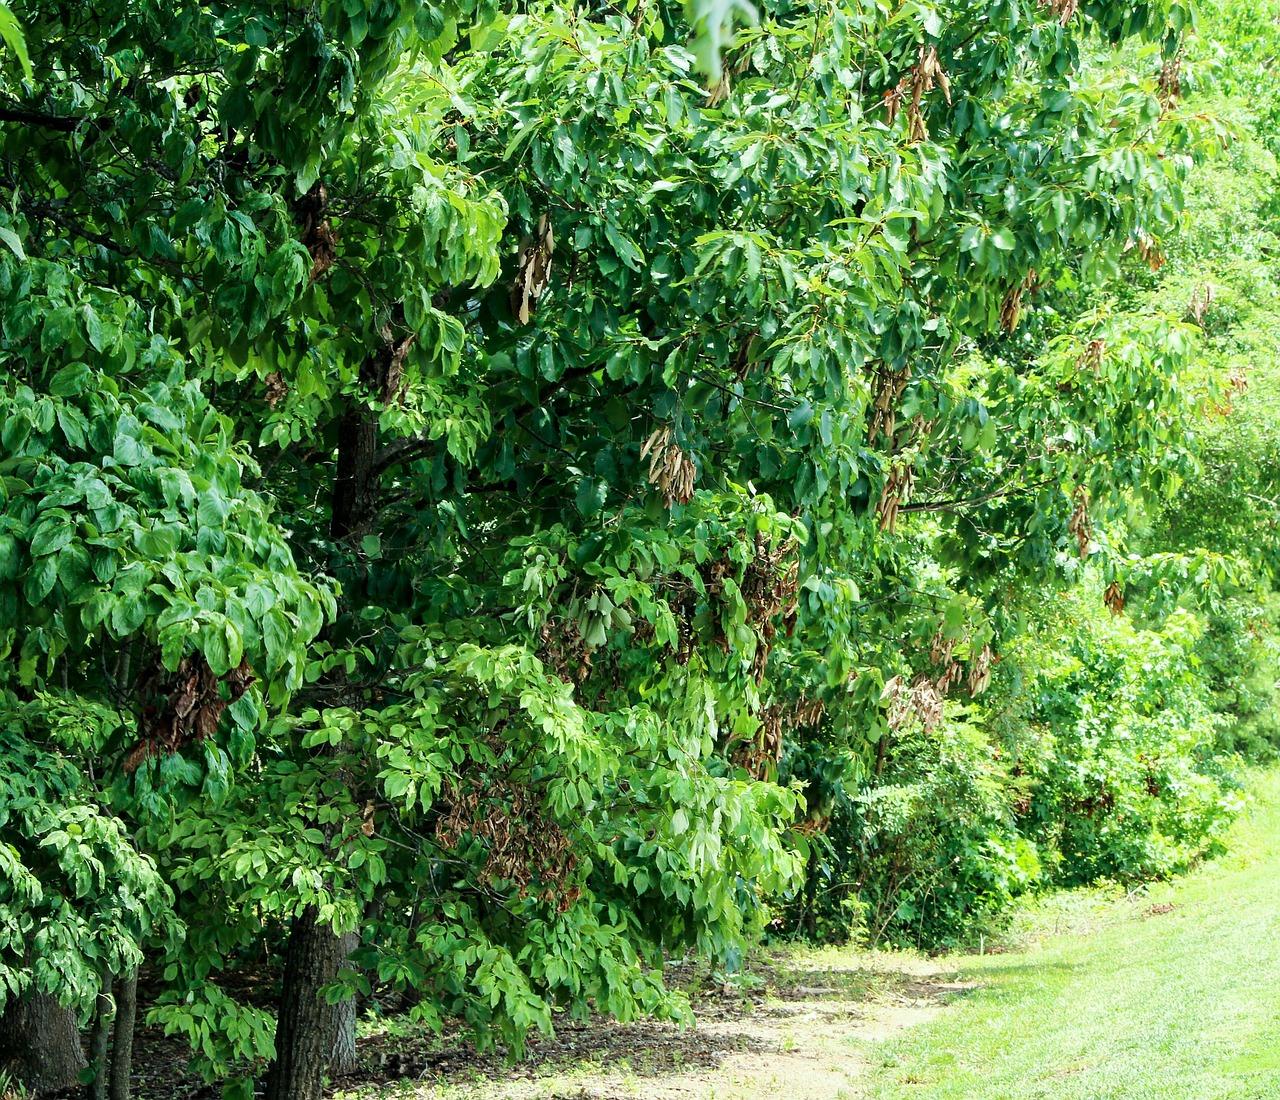 Trimming Shrubs - trees-143302_1280